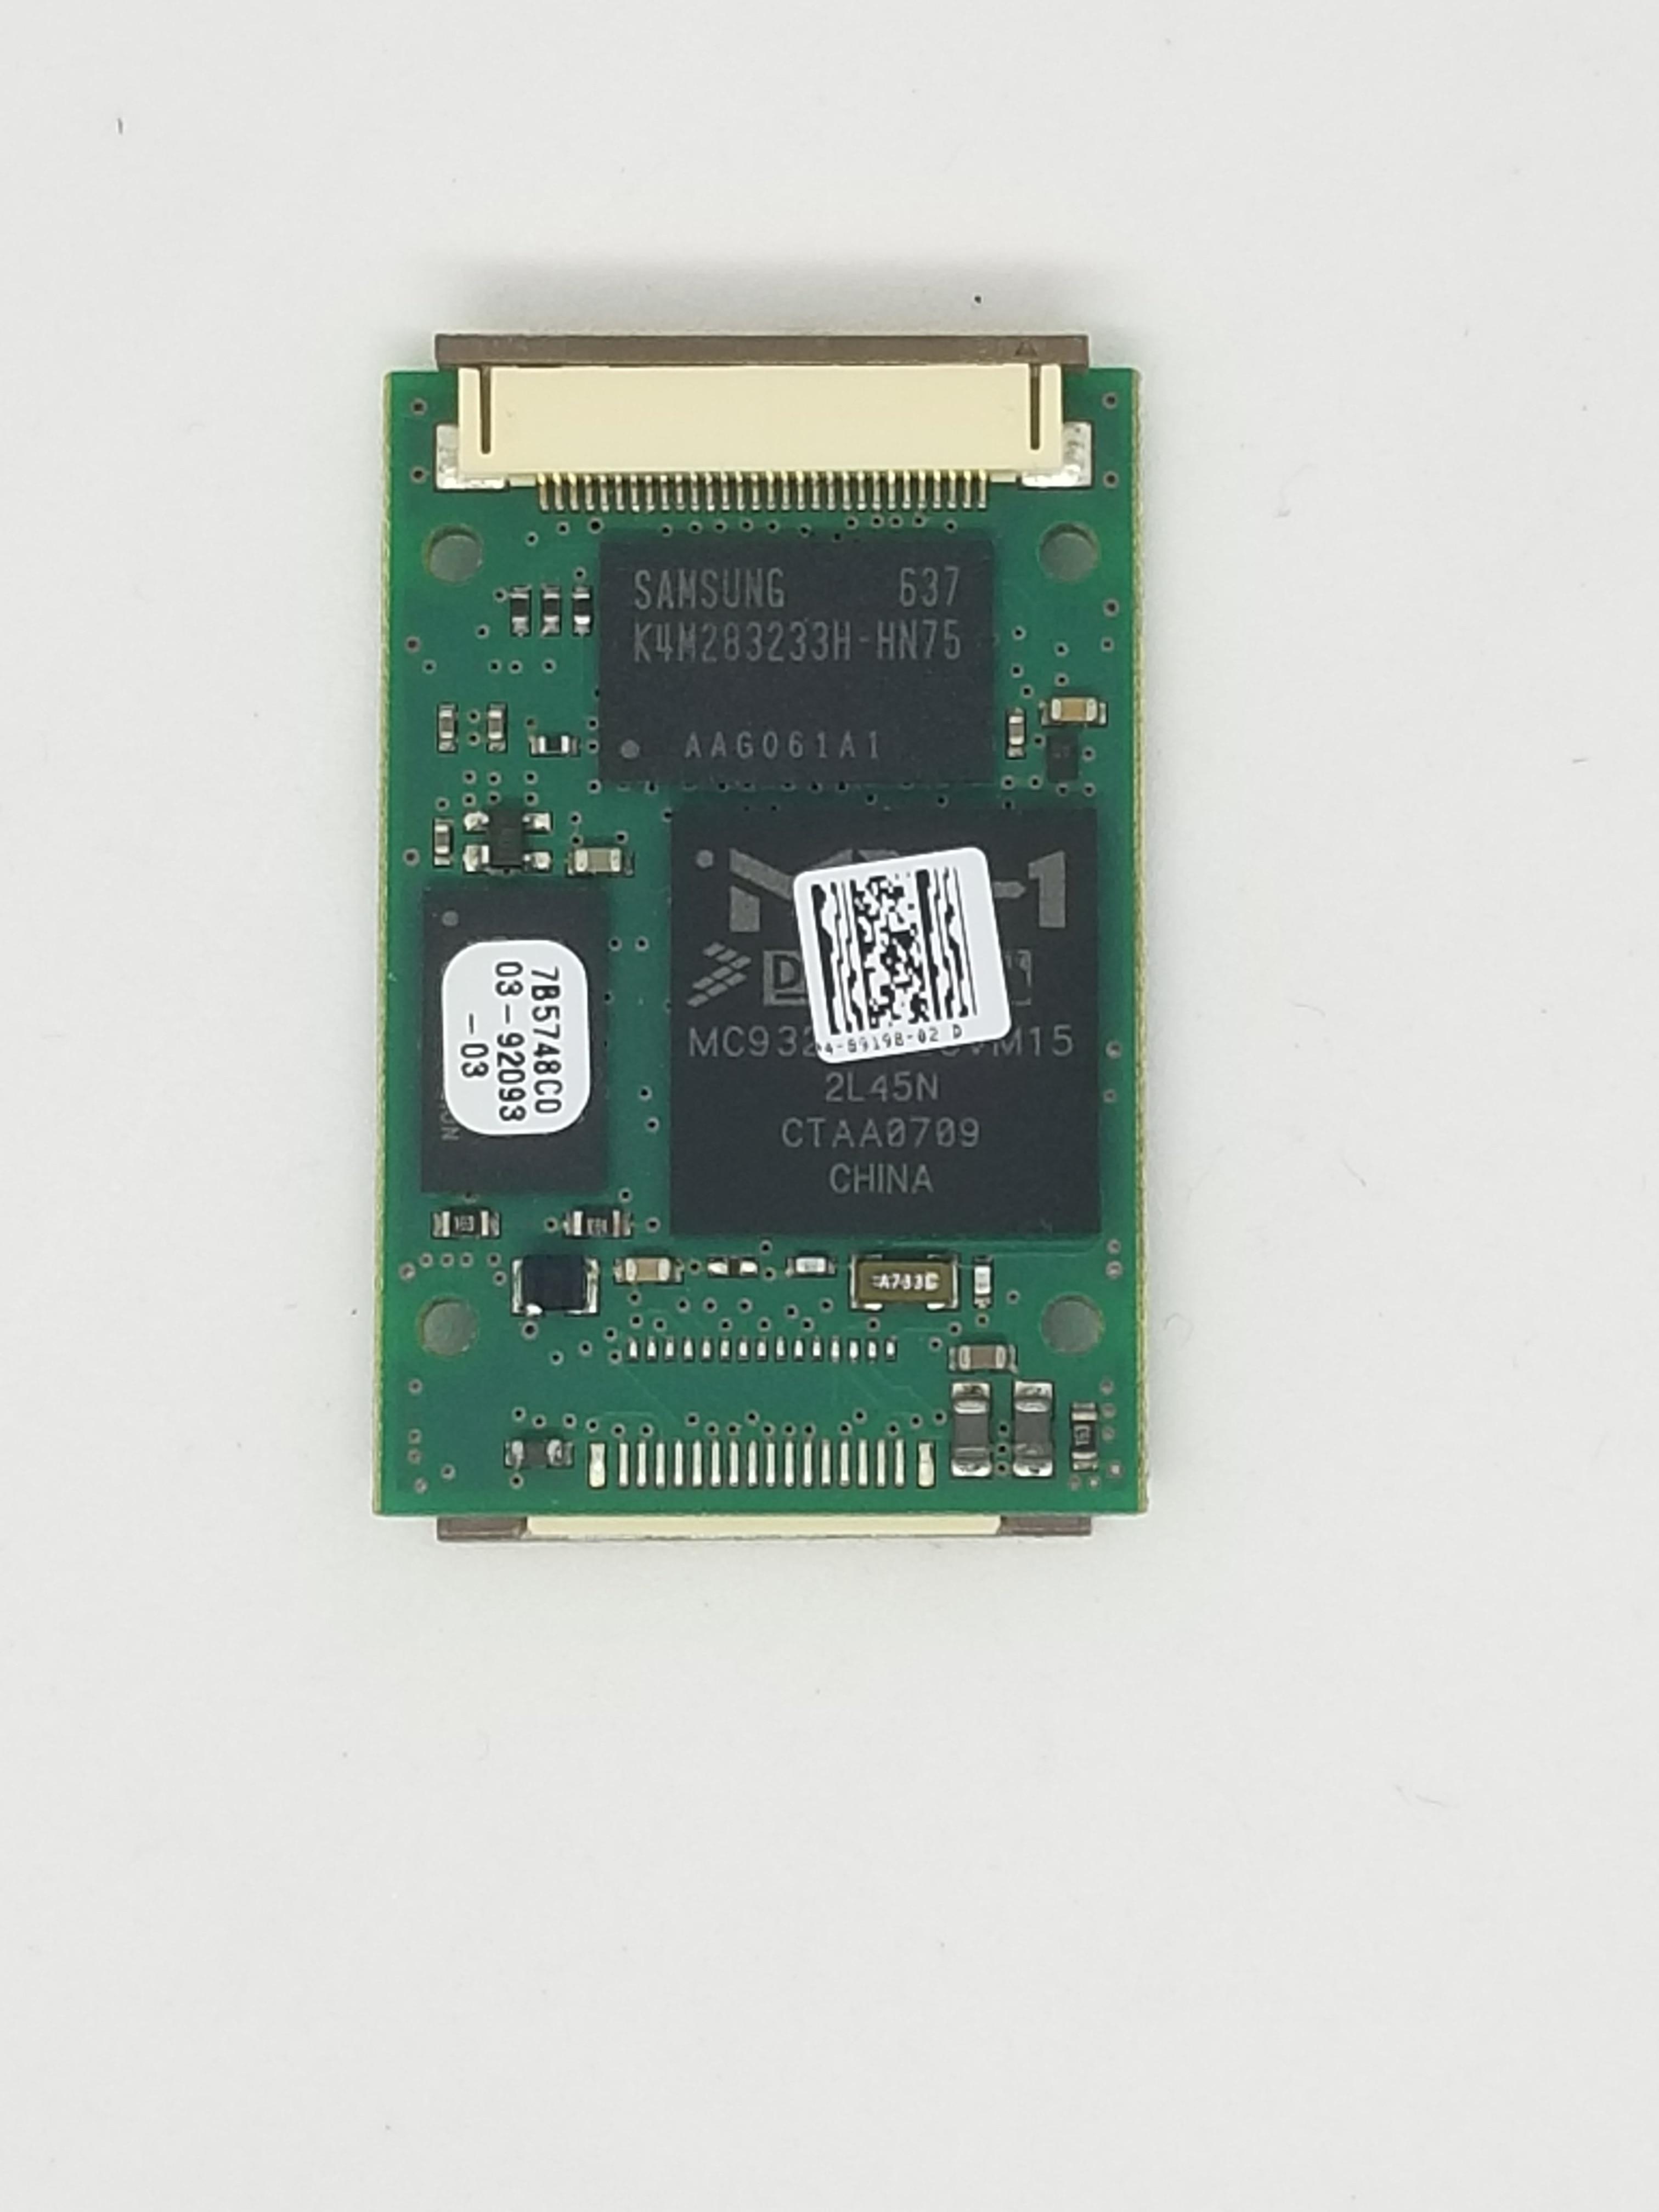 PL-6707-B000R S/N:MODMP9R89198-02D الماسح الضوئي فك